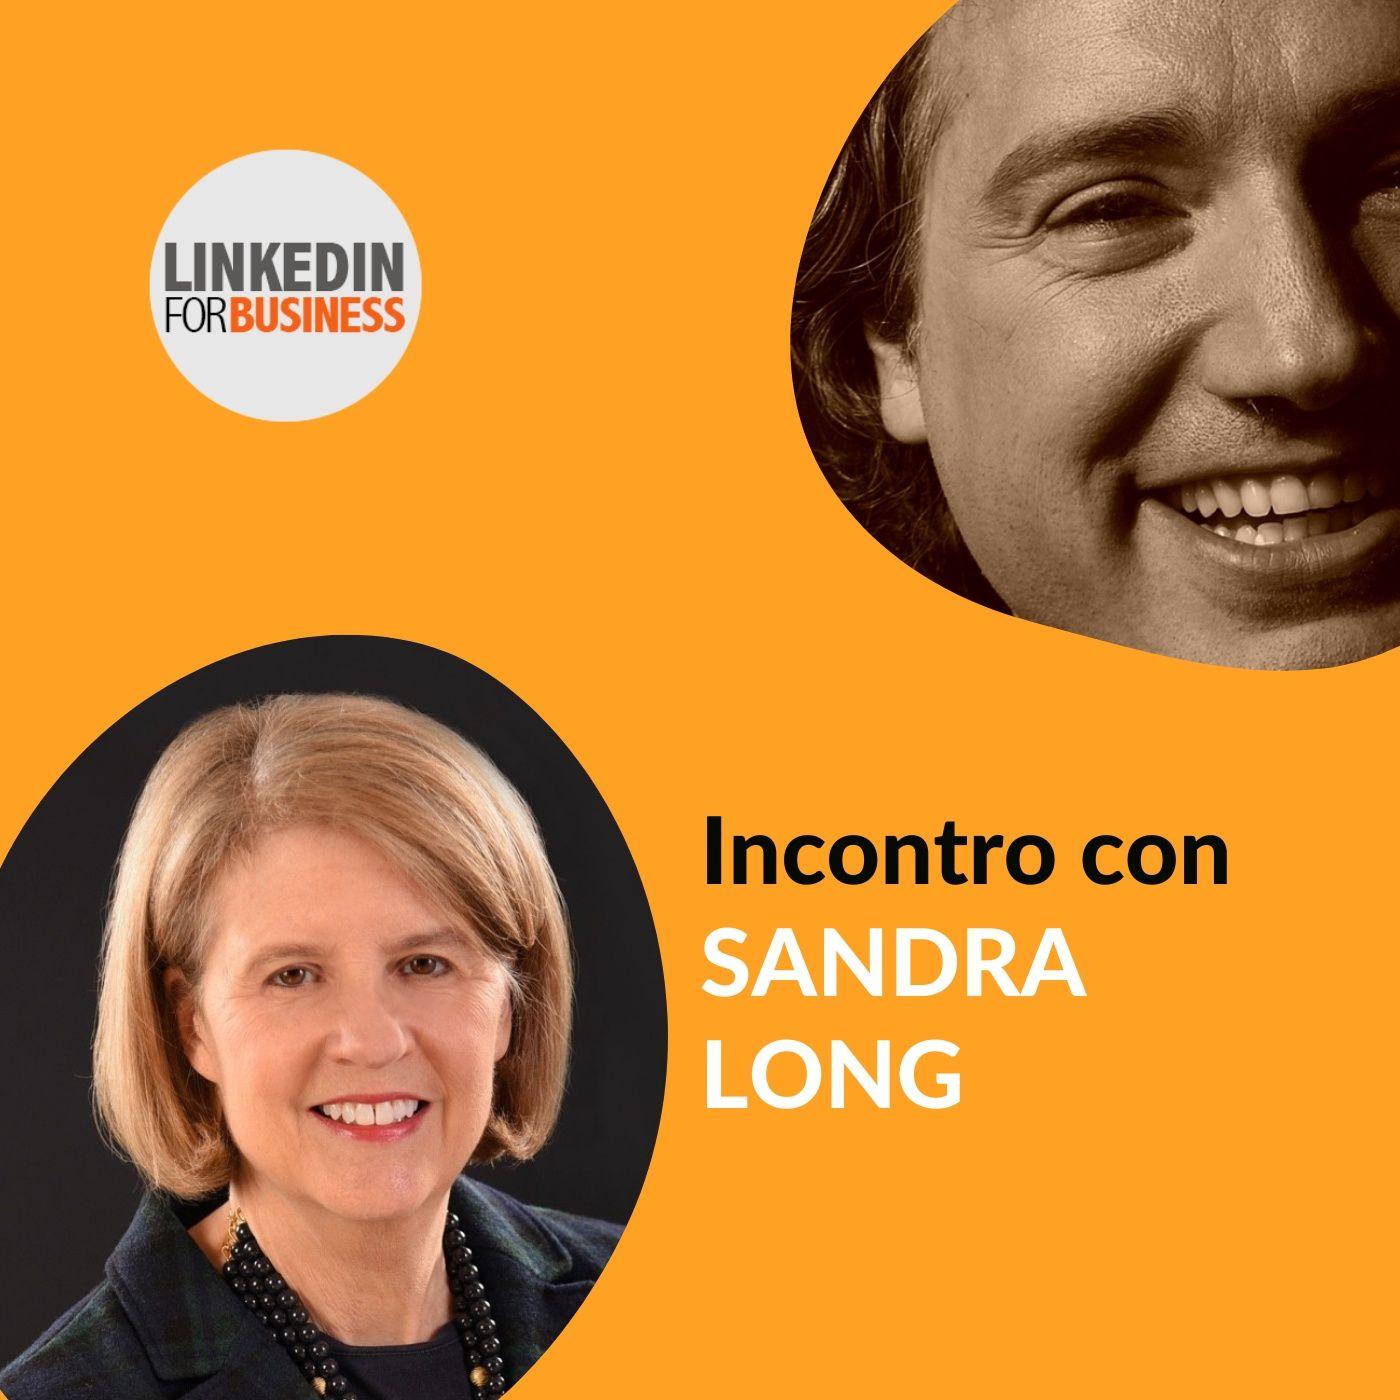 133 - LinkedInForBusiness incontra Sandra Long